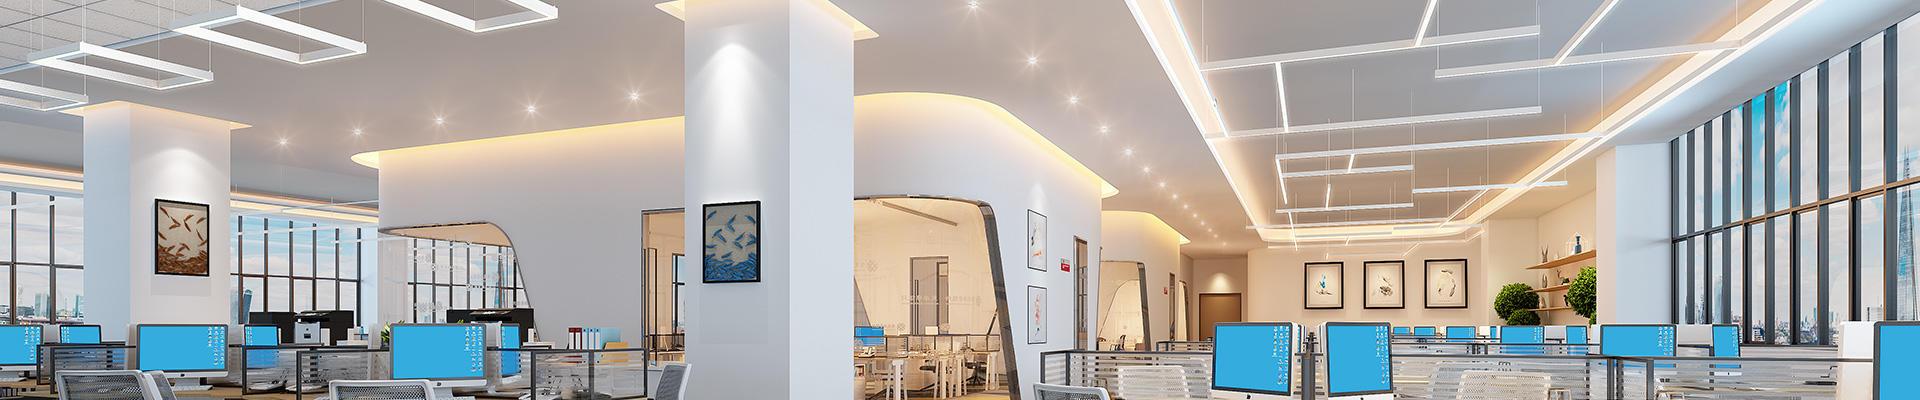 Architectural Slim LED Linear Light Fixture